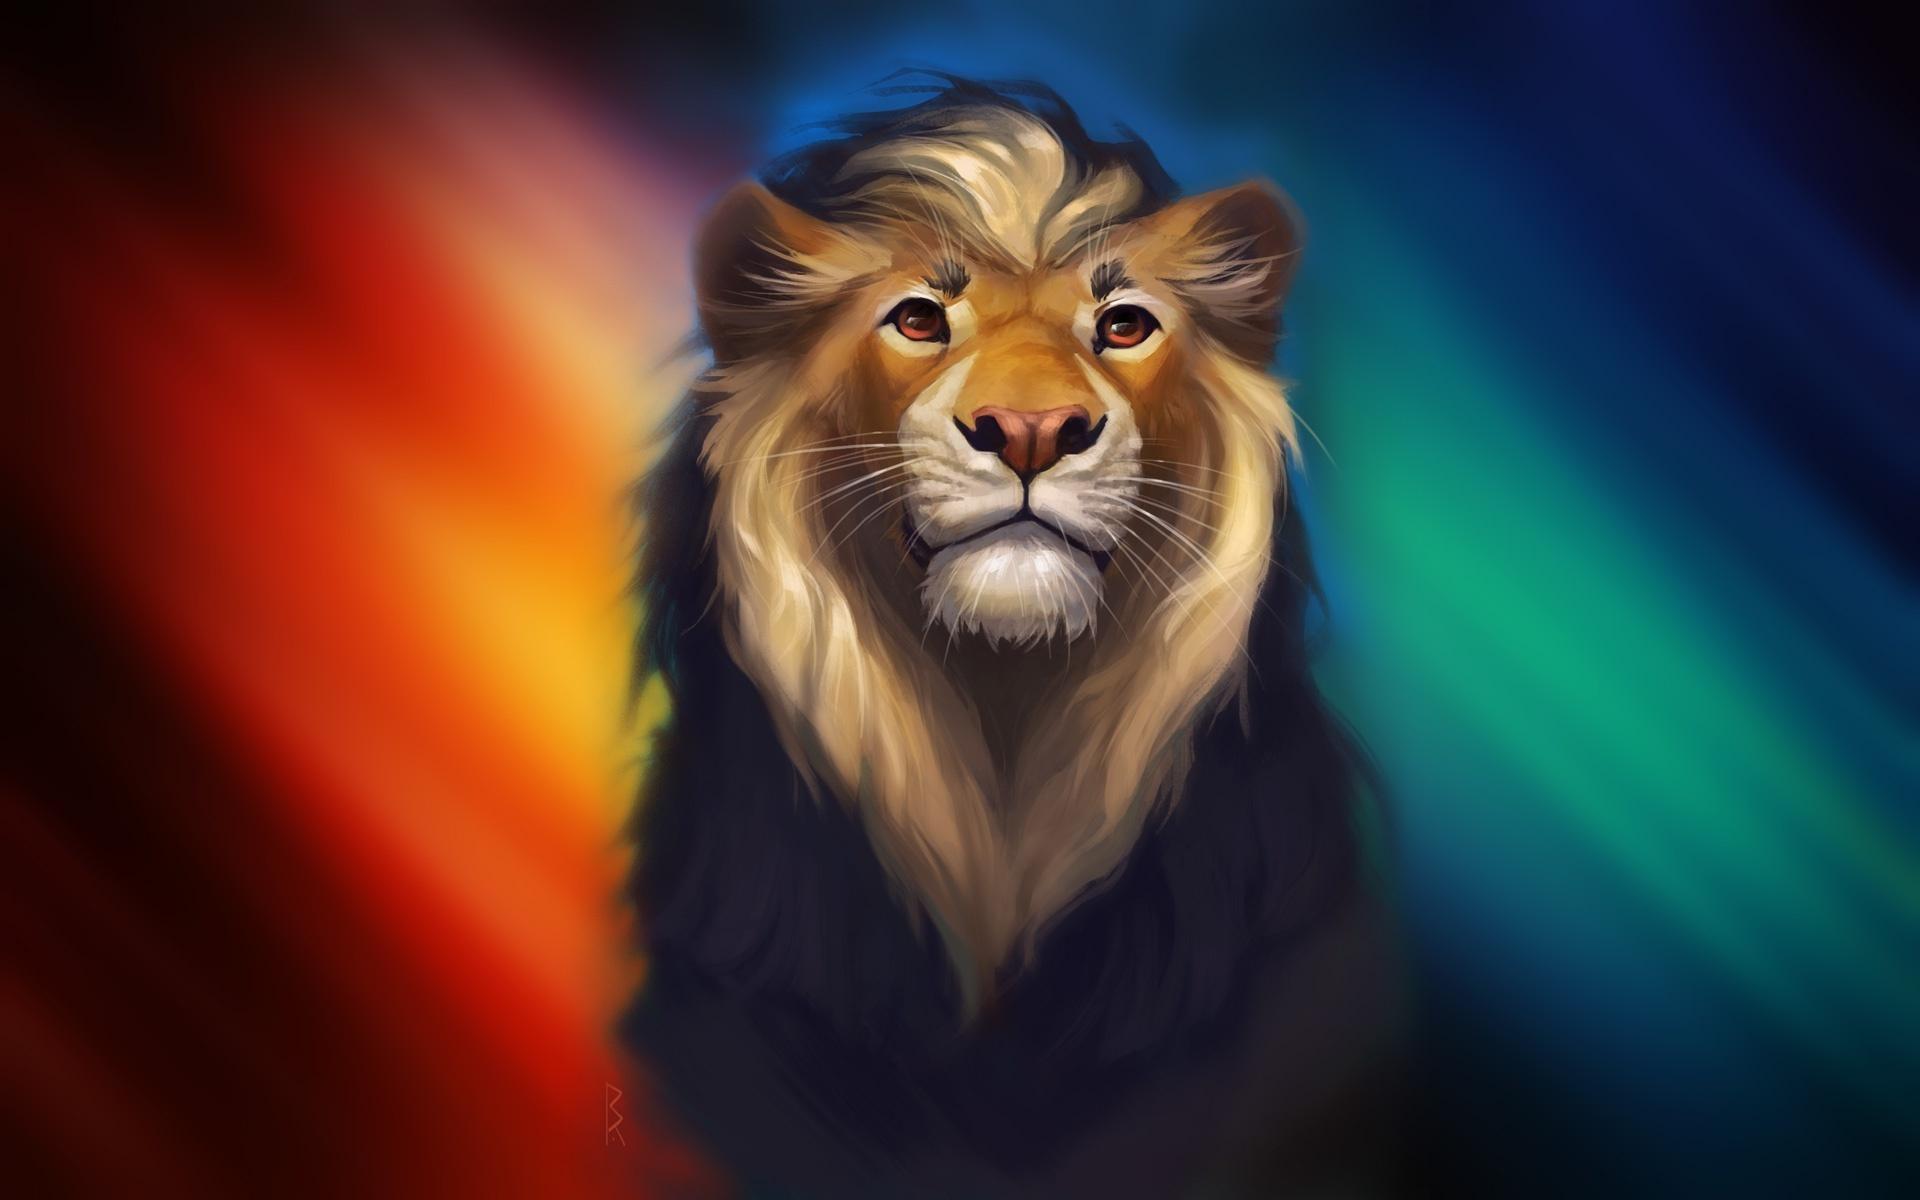 Wallpaper Lion Artwork Digital Art Colorful 1920x1200